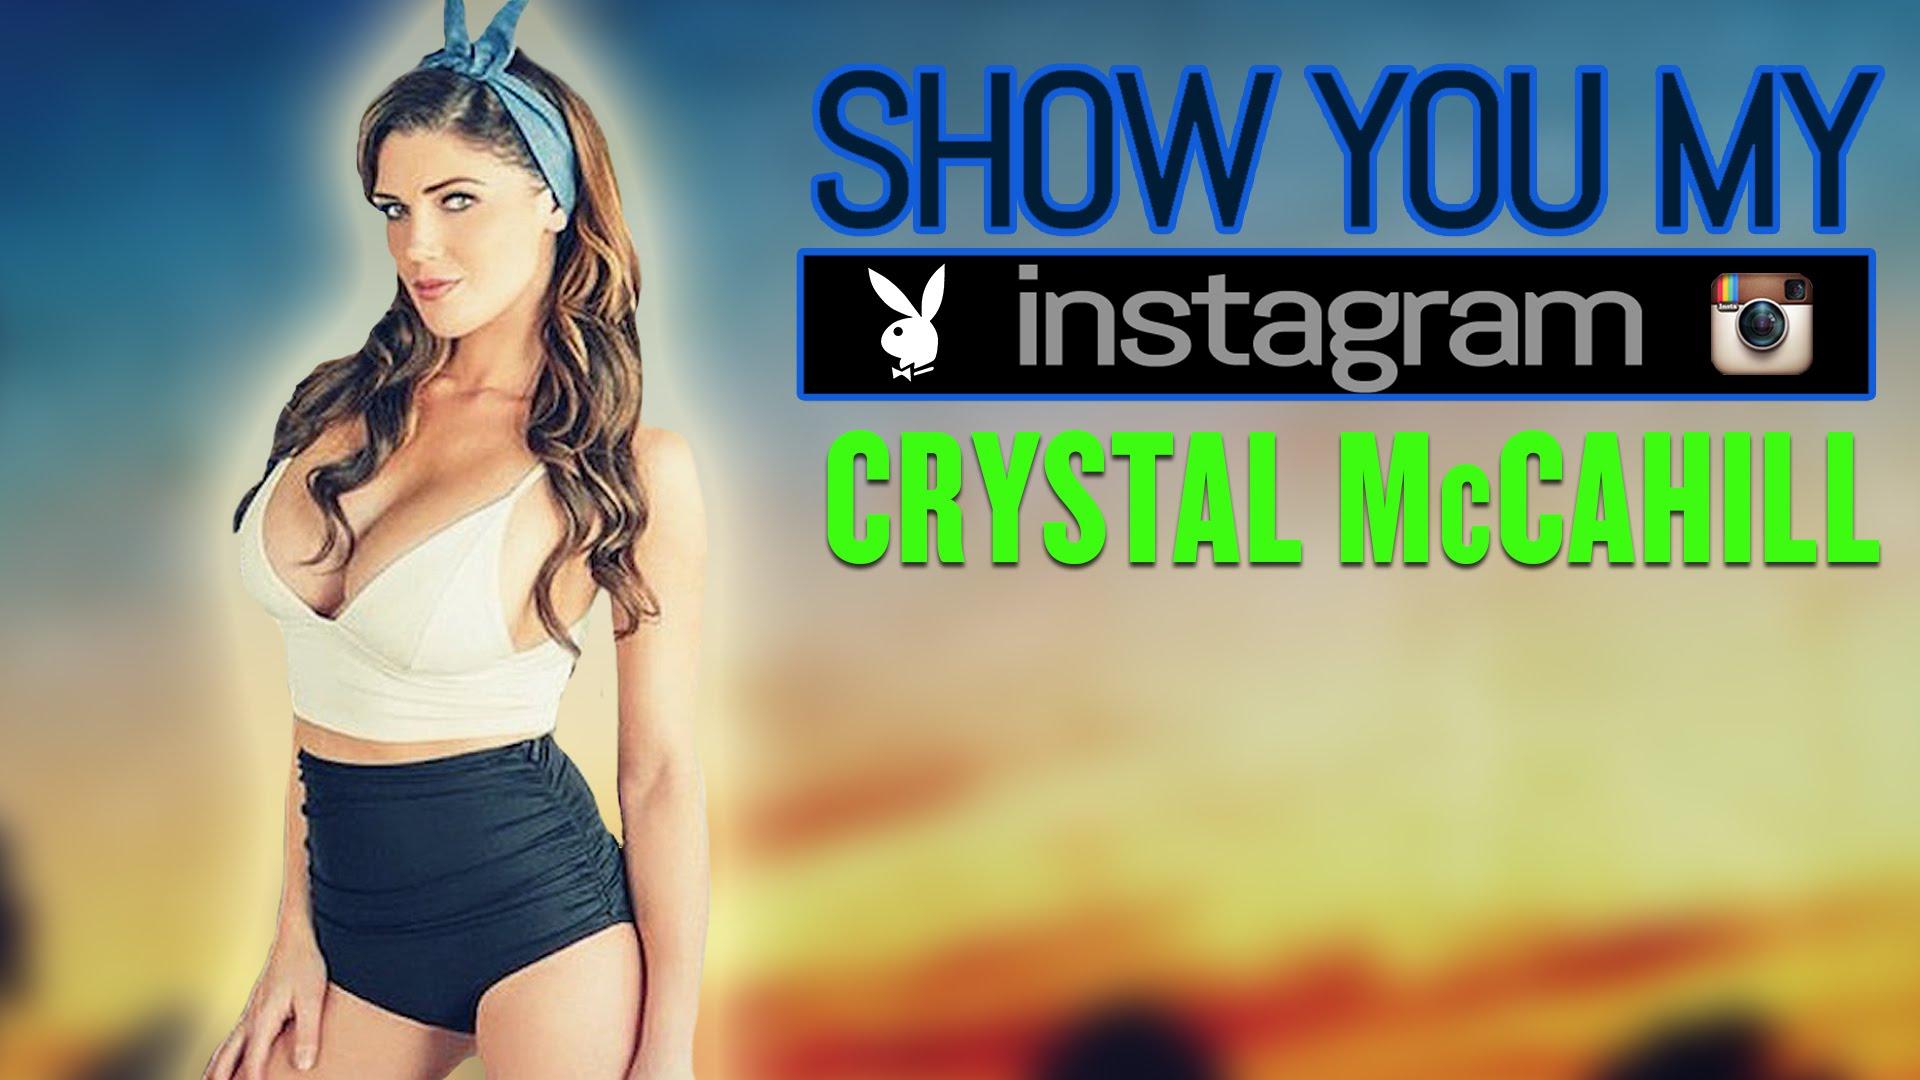 Conheça o Instagram de Crystal McCahill